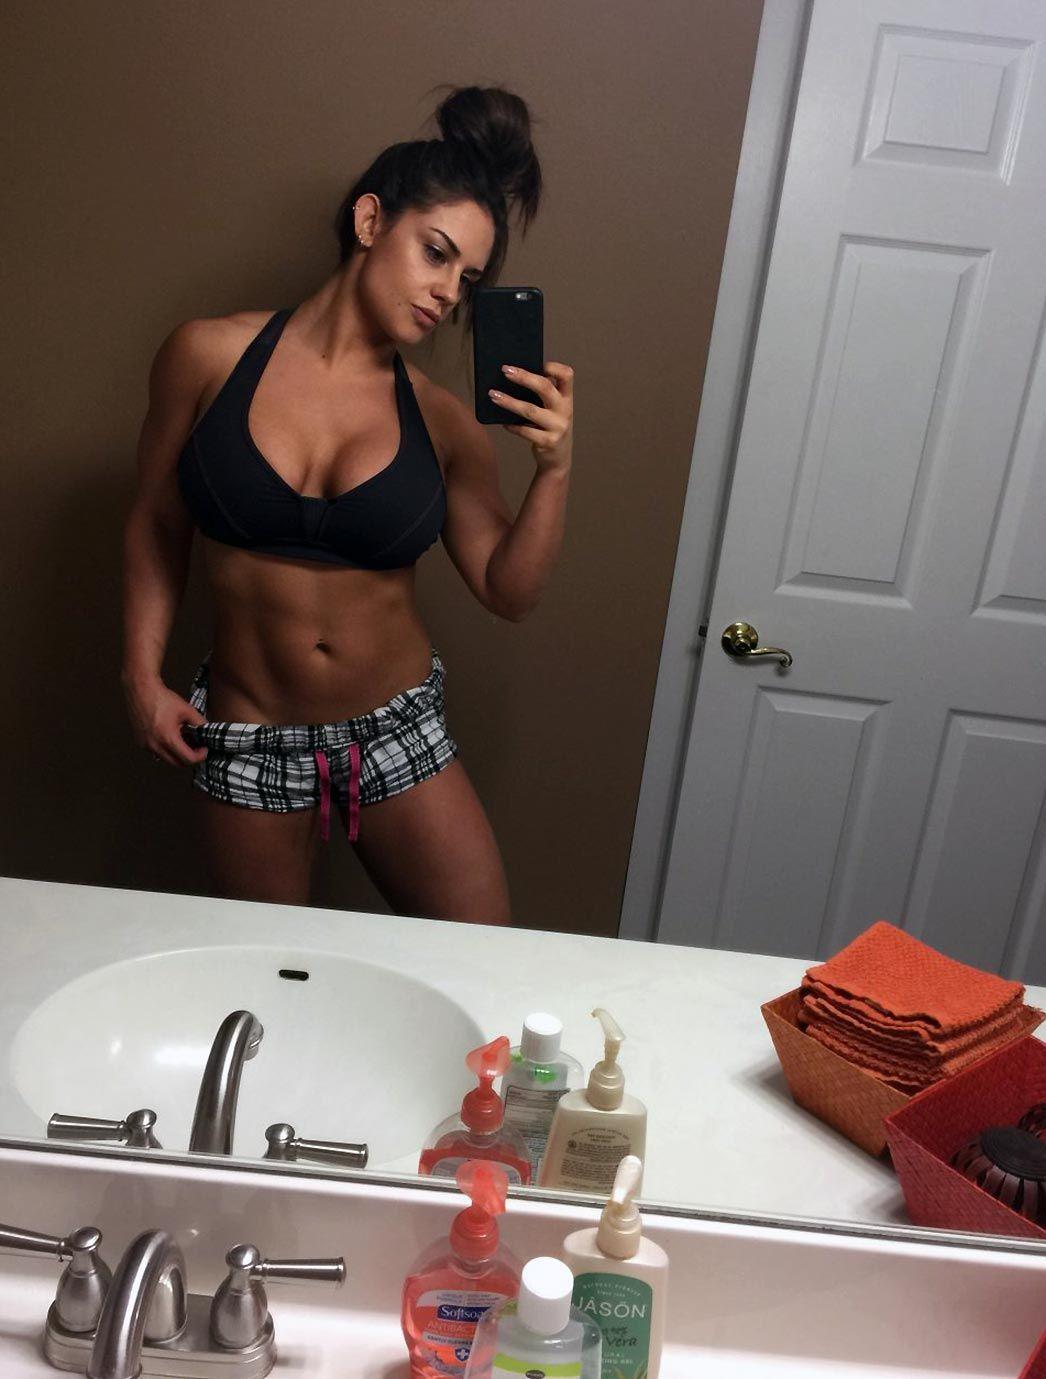 Celeste Bonin Nude Leaked The Fappening & Sexy 0141